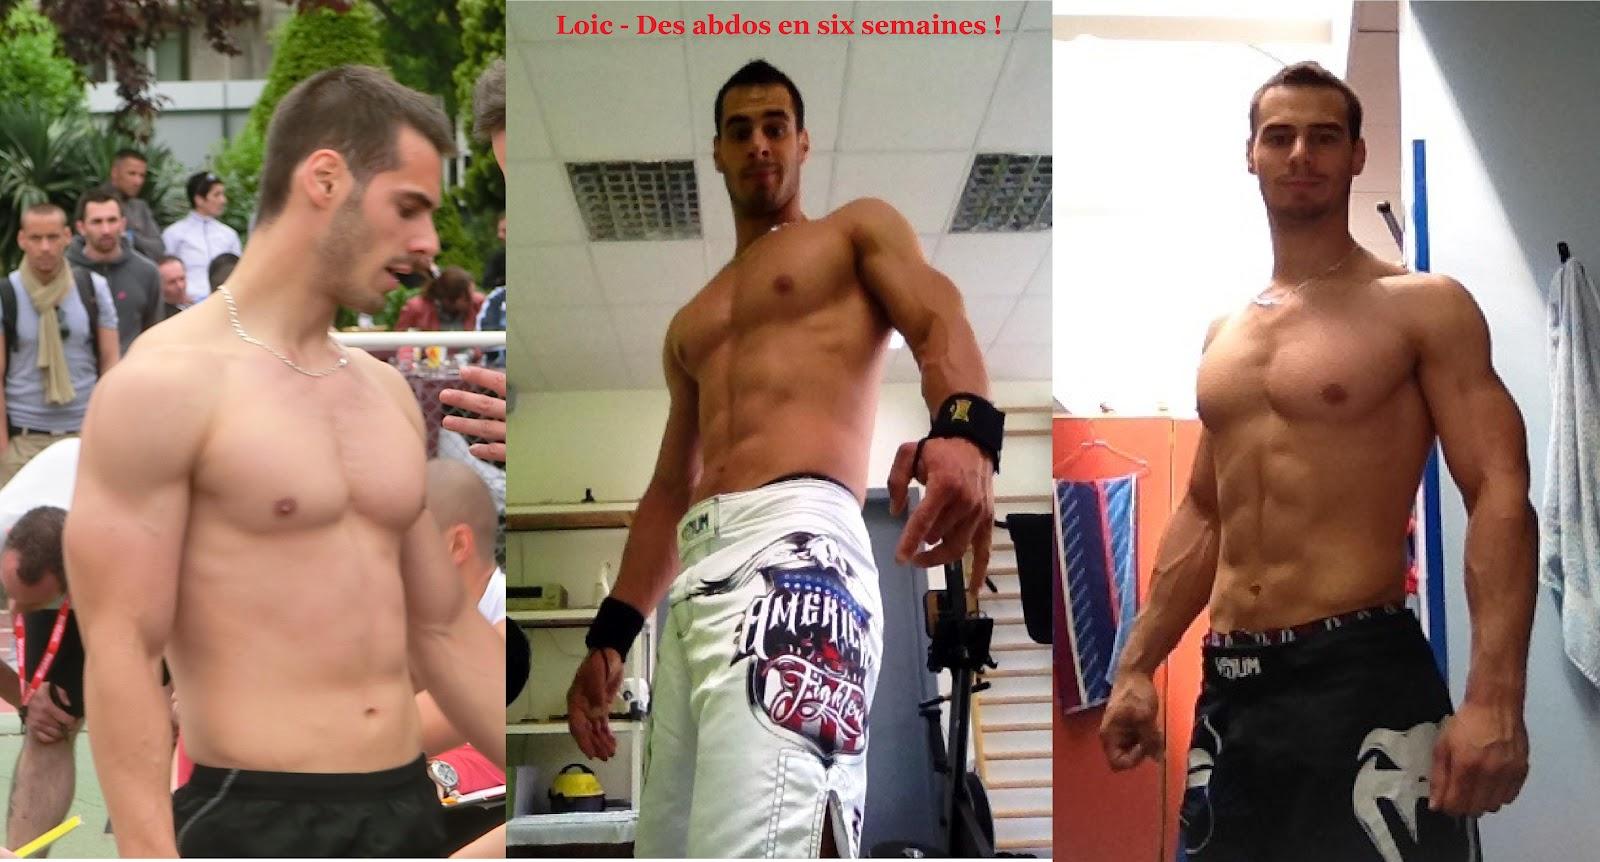 Homme muscle poilu paris gay pride 2018 dates